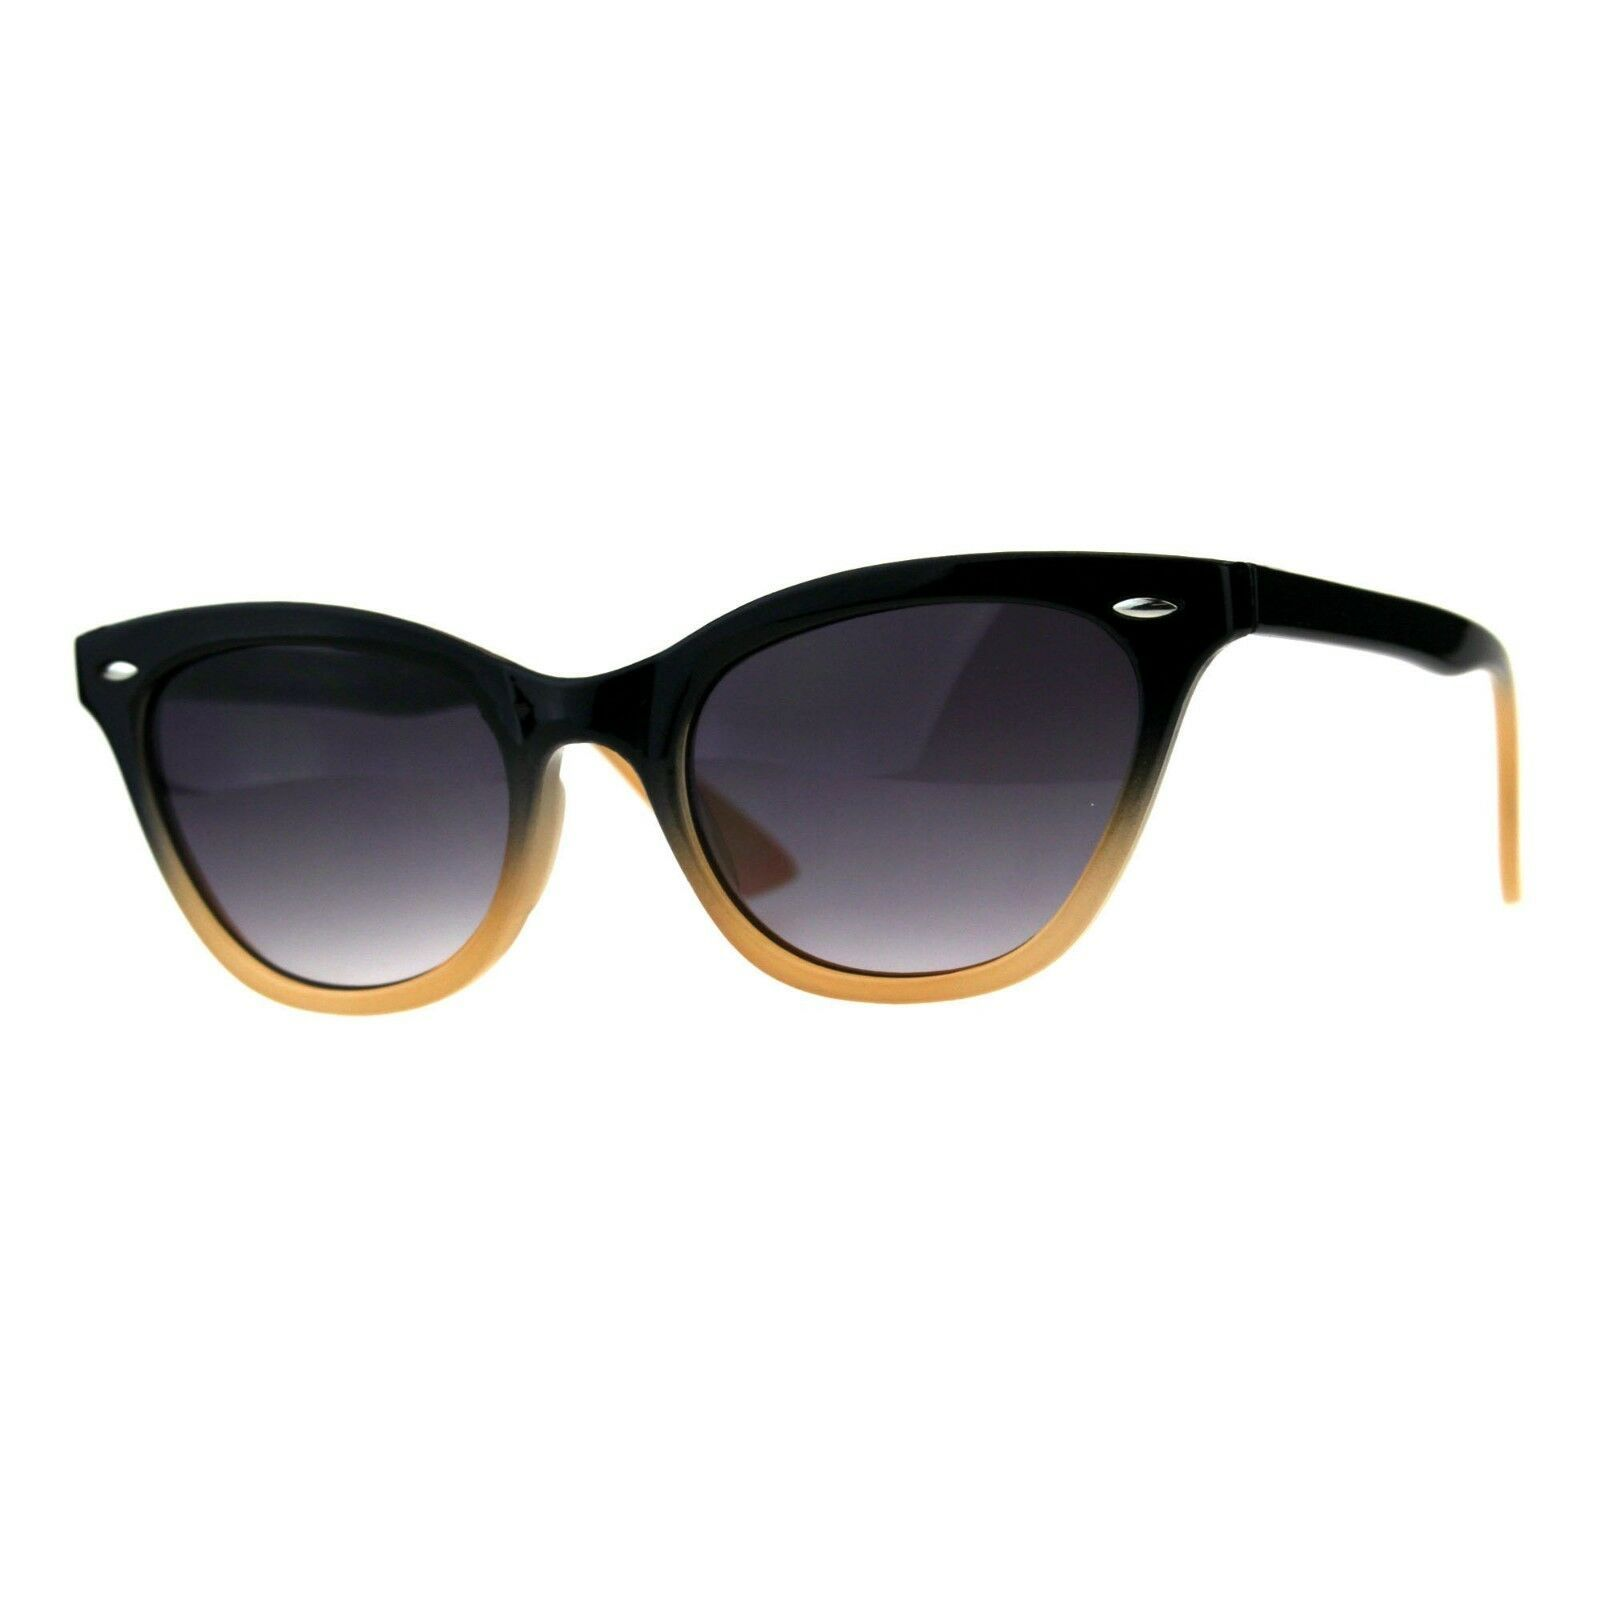 Womens Oval Cateye Fashion Sunglasses Black & Color 2 Tone Shades UV 400